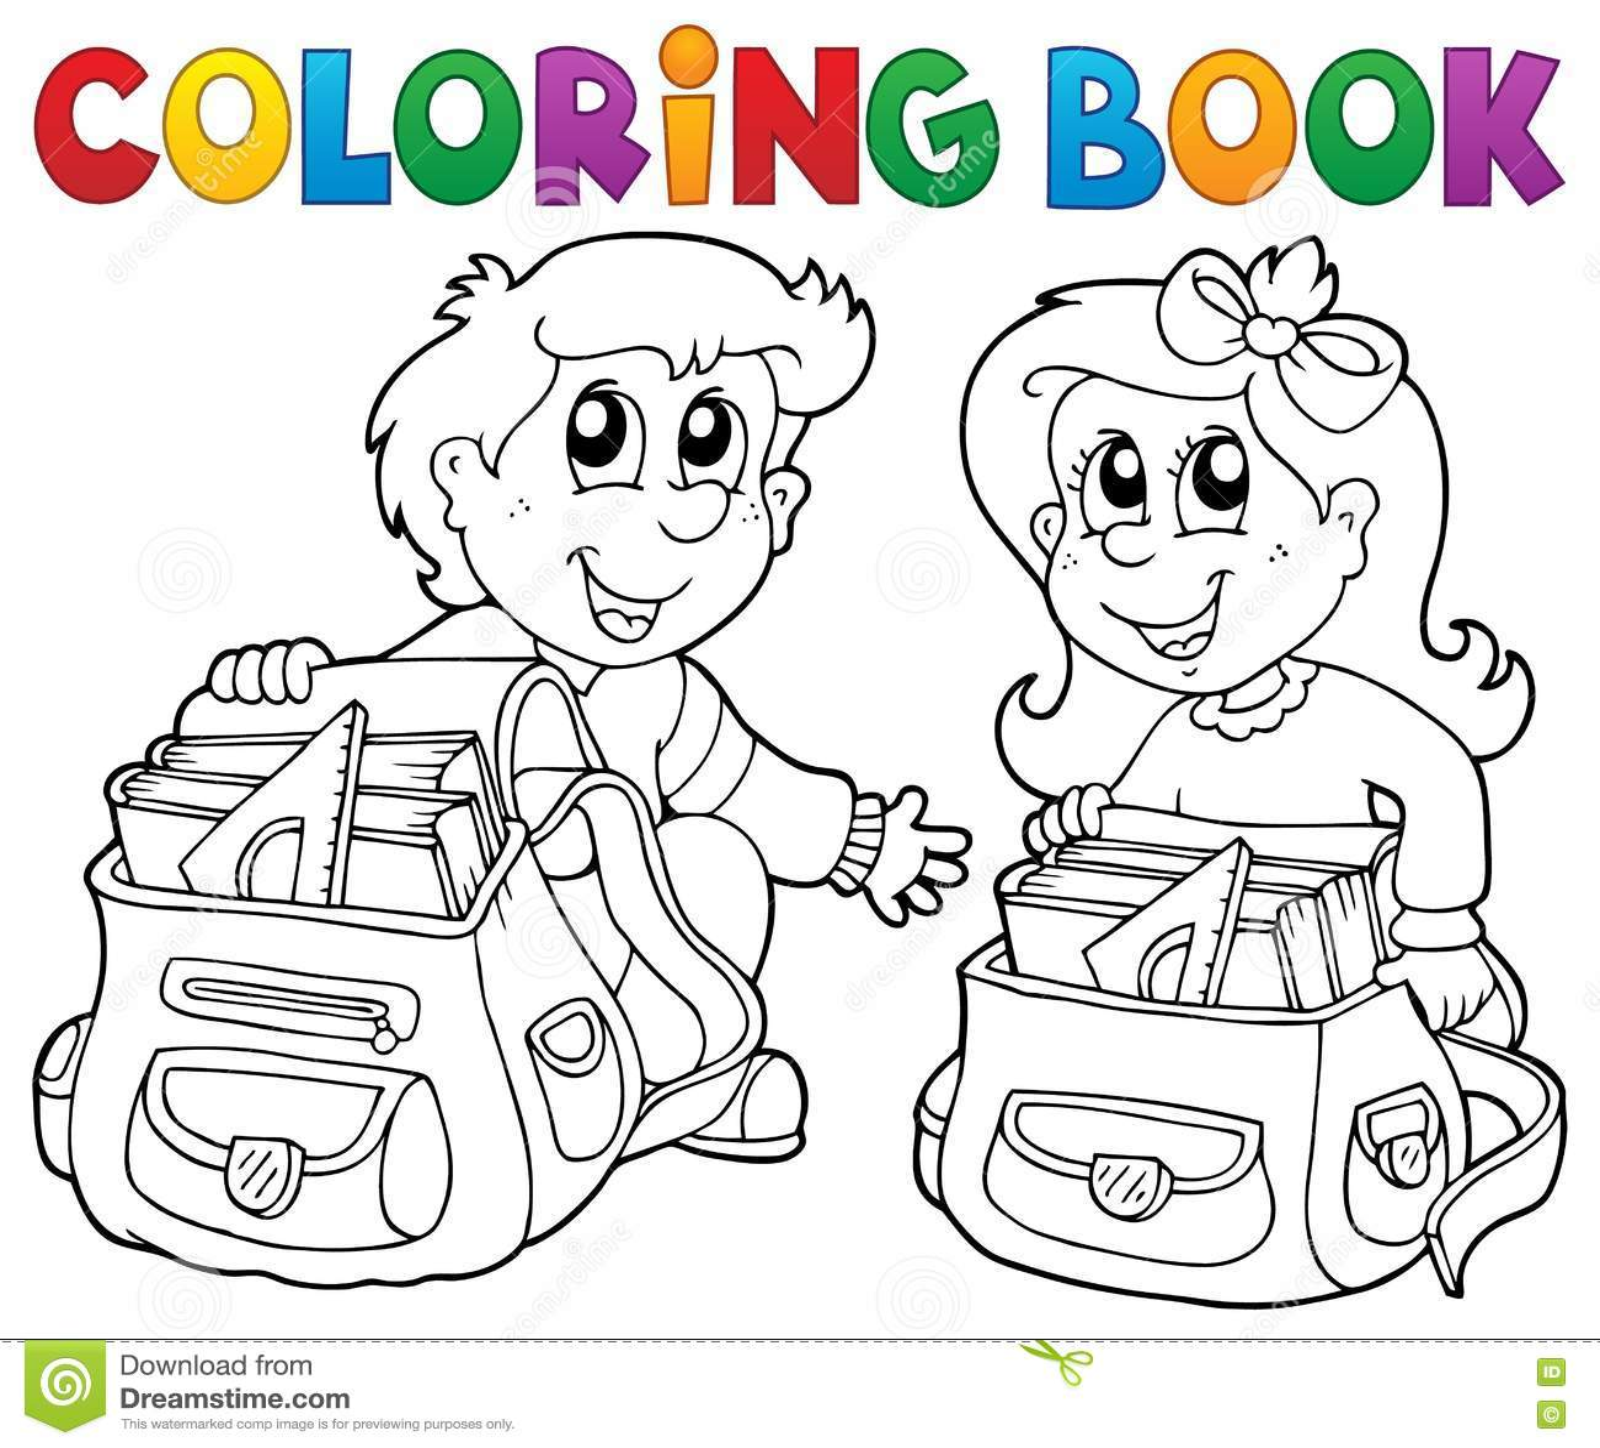 Coloring book school - Book Coloring Eps10 Illustration Kids School